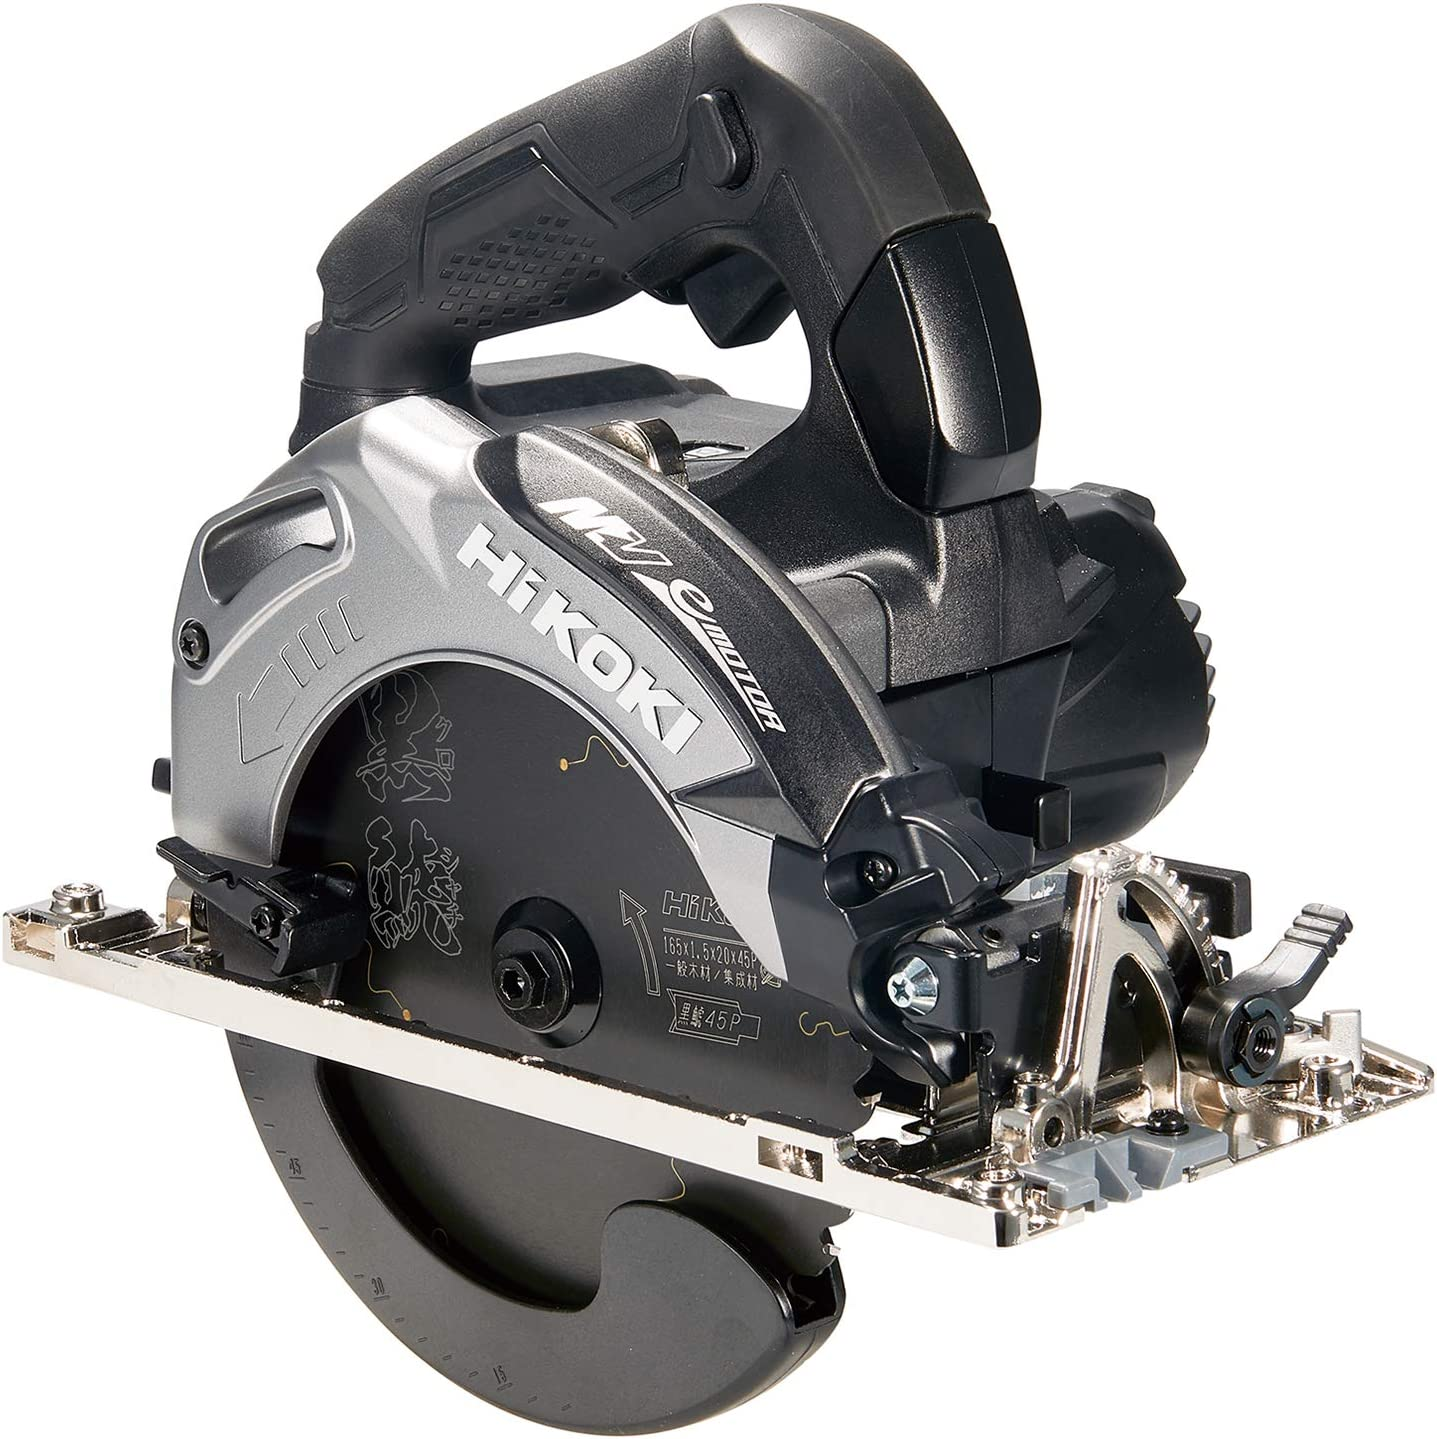 HiKOKI(ハイコーキ) コードレス丸のこ 36V マルチボルト 充電式・蓄電池・充電器別売り 刃径165mm ブラック ※純正梱包箱付 C3606DA (NNB)(K) スーパーチップソー黒鯱仕様